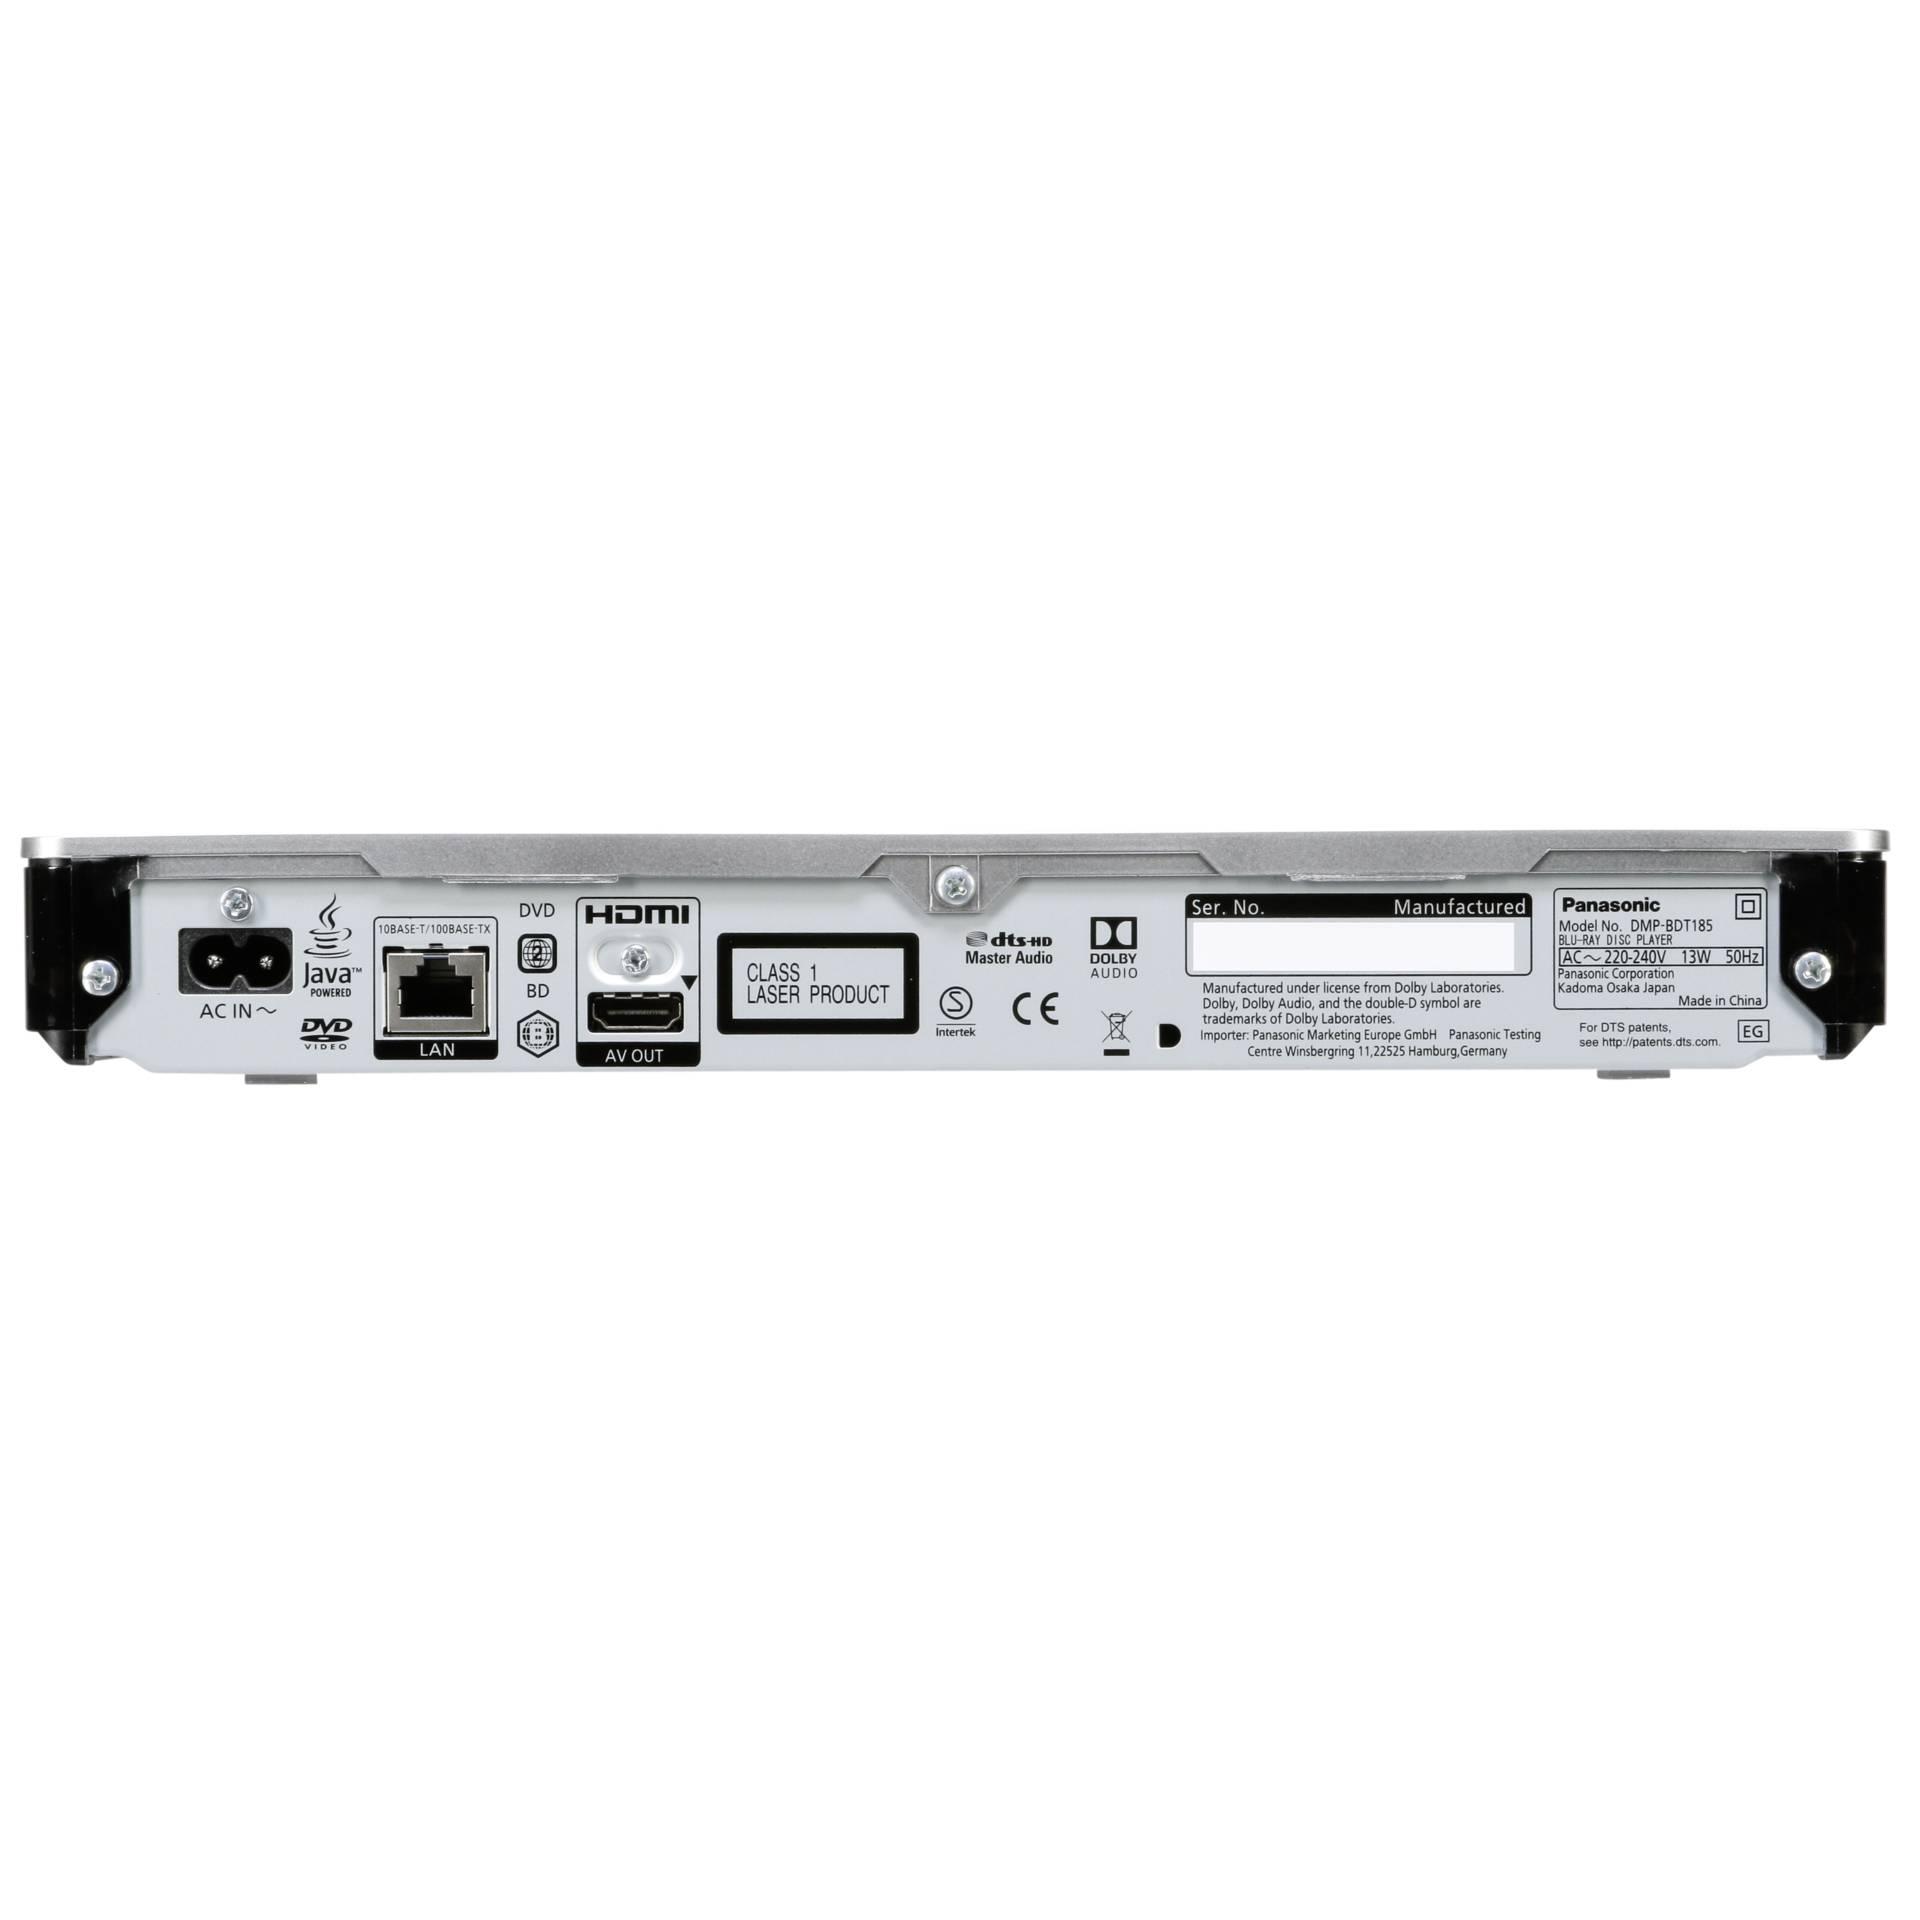 Panasonic DMP-BDT185EG 3D Blu-ray Player TOP Series weies 4K HDMI ...